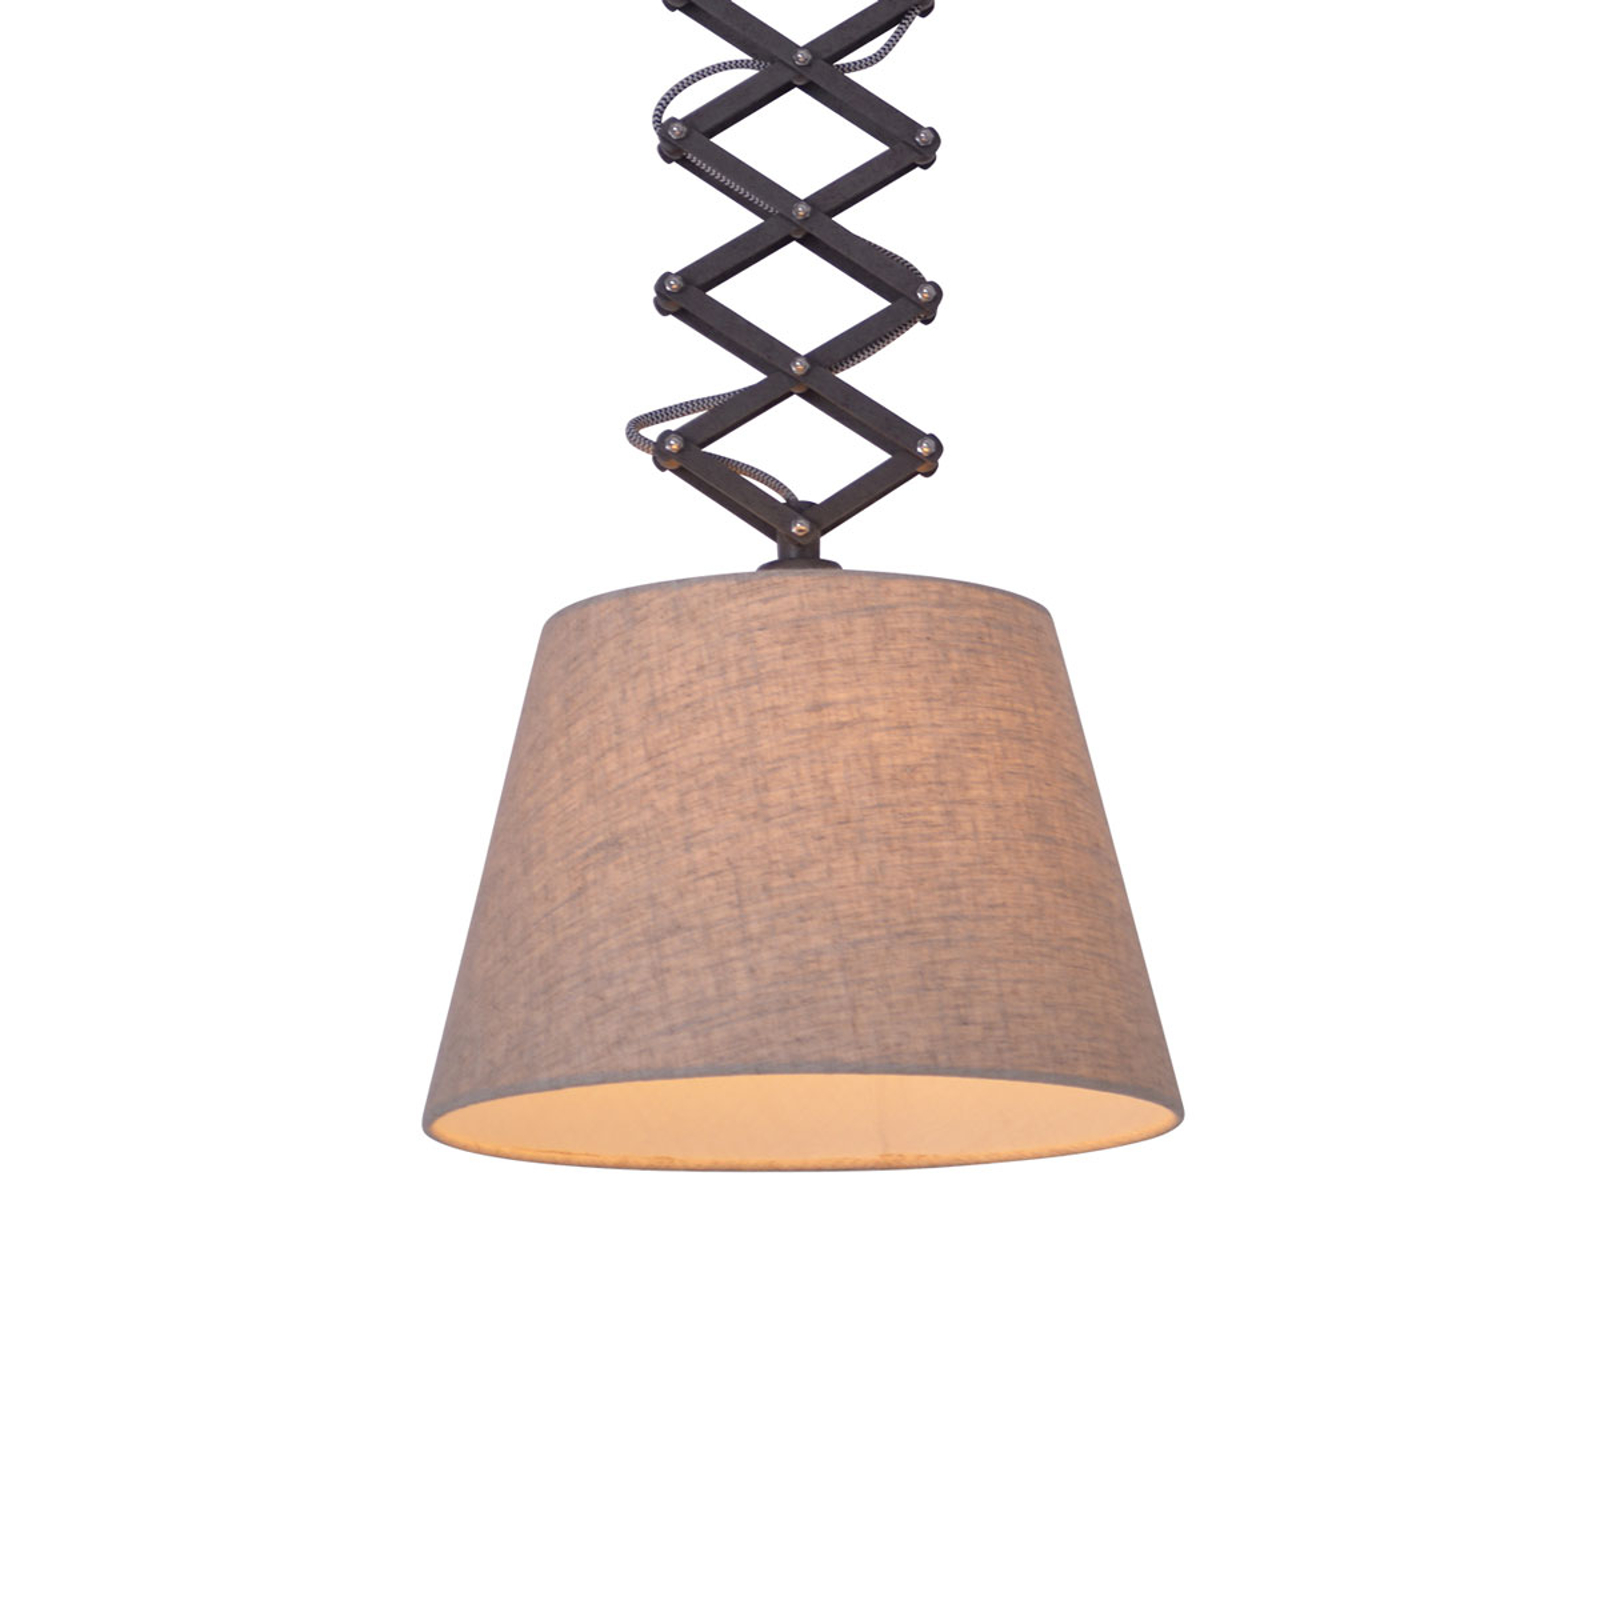 Textiel-plafondlamp Adrienne in hoogte verstelbaar